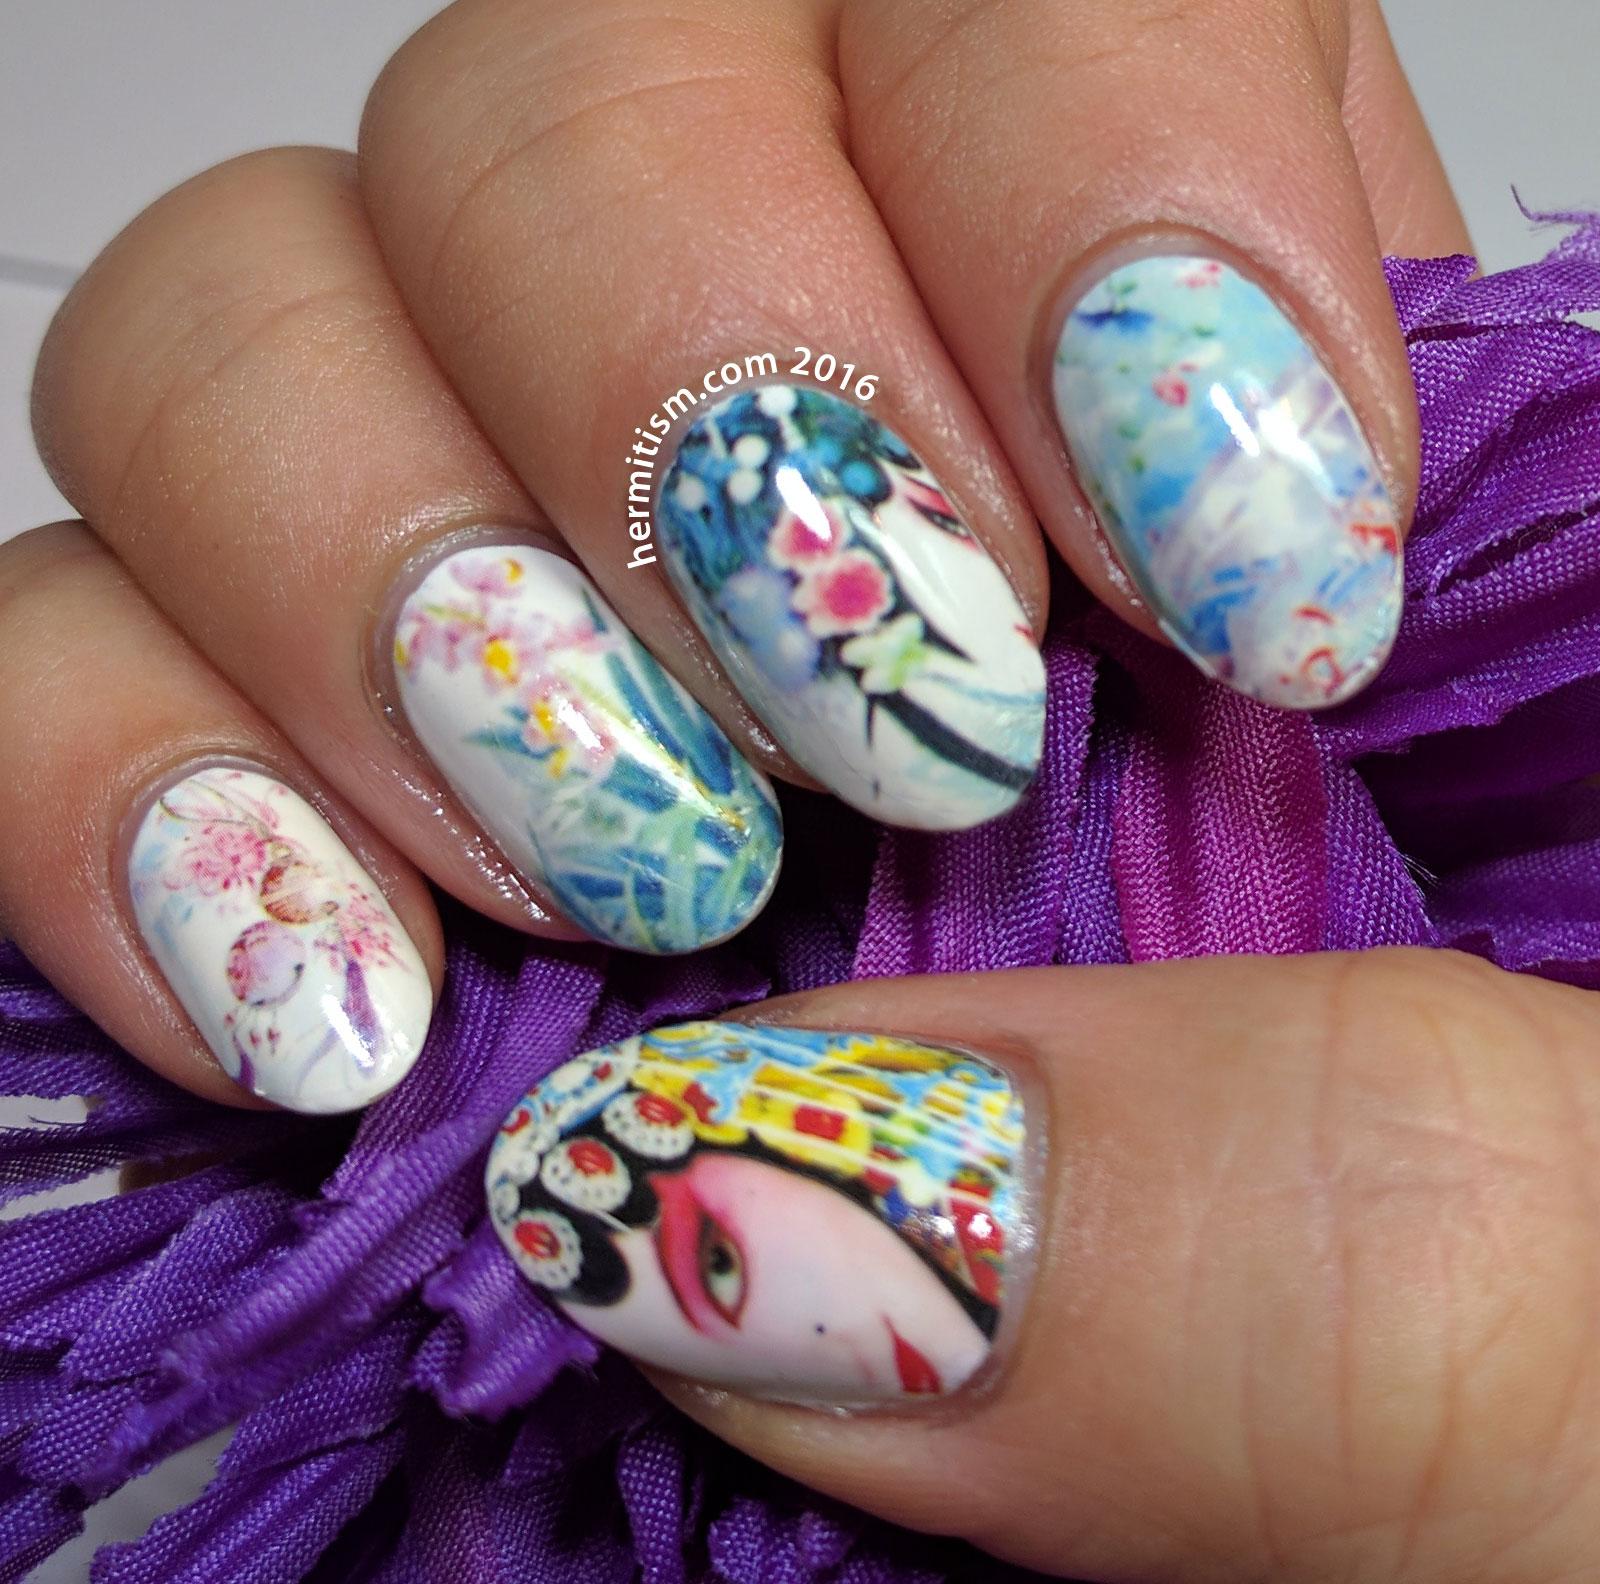 Chinese Opera - 31 Day Nail Art Challenge (art) - Hermit Werds